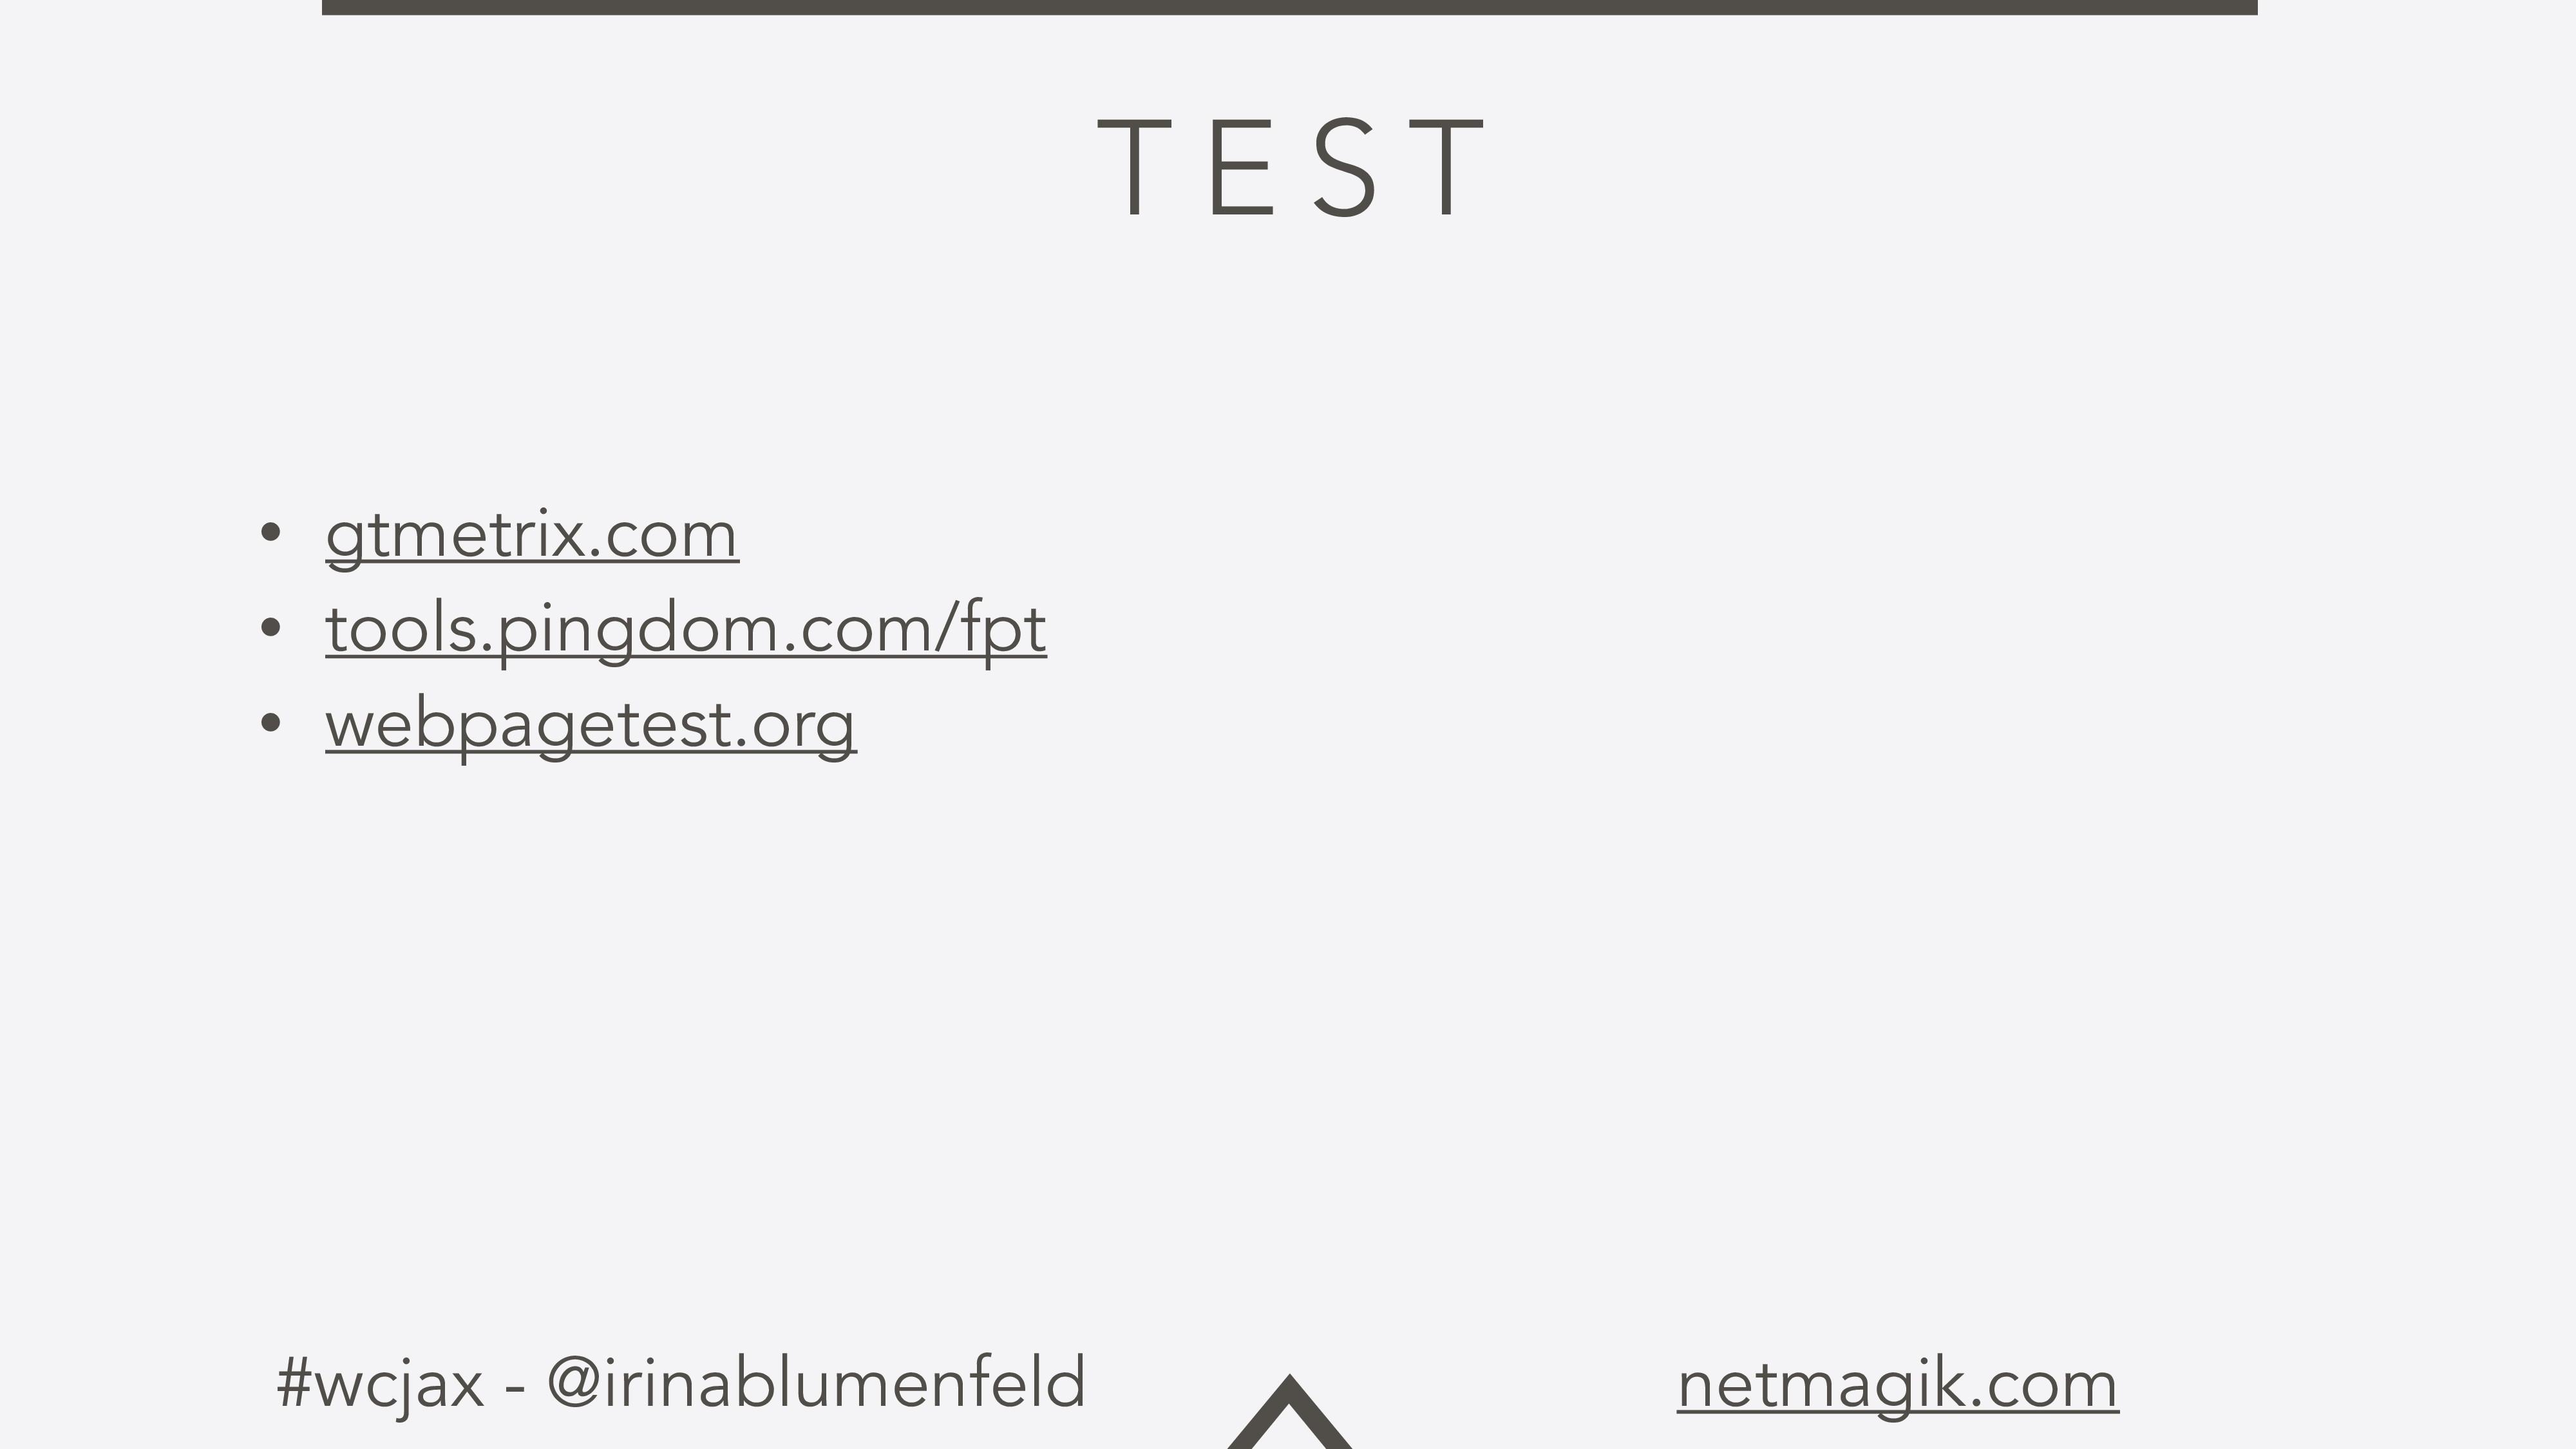 #wcjax - @irinablumenfeld netmagik.com T E S T ...